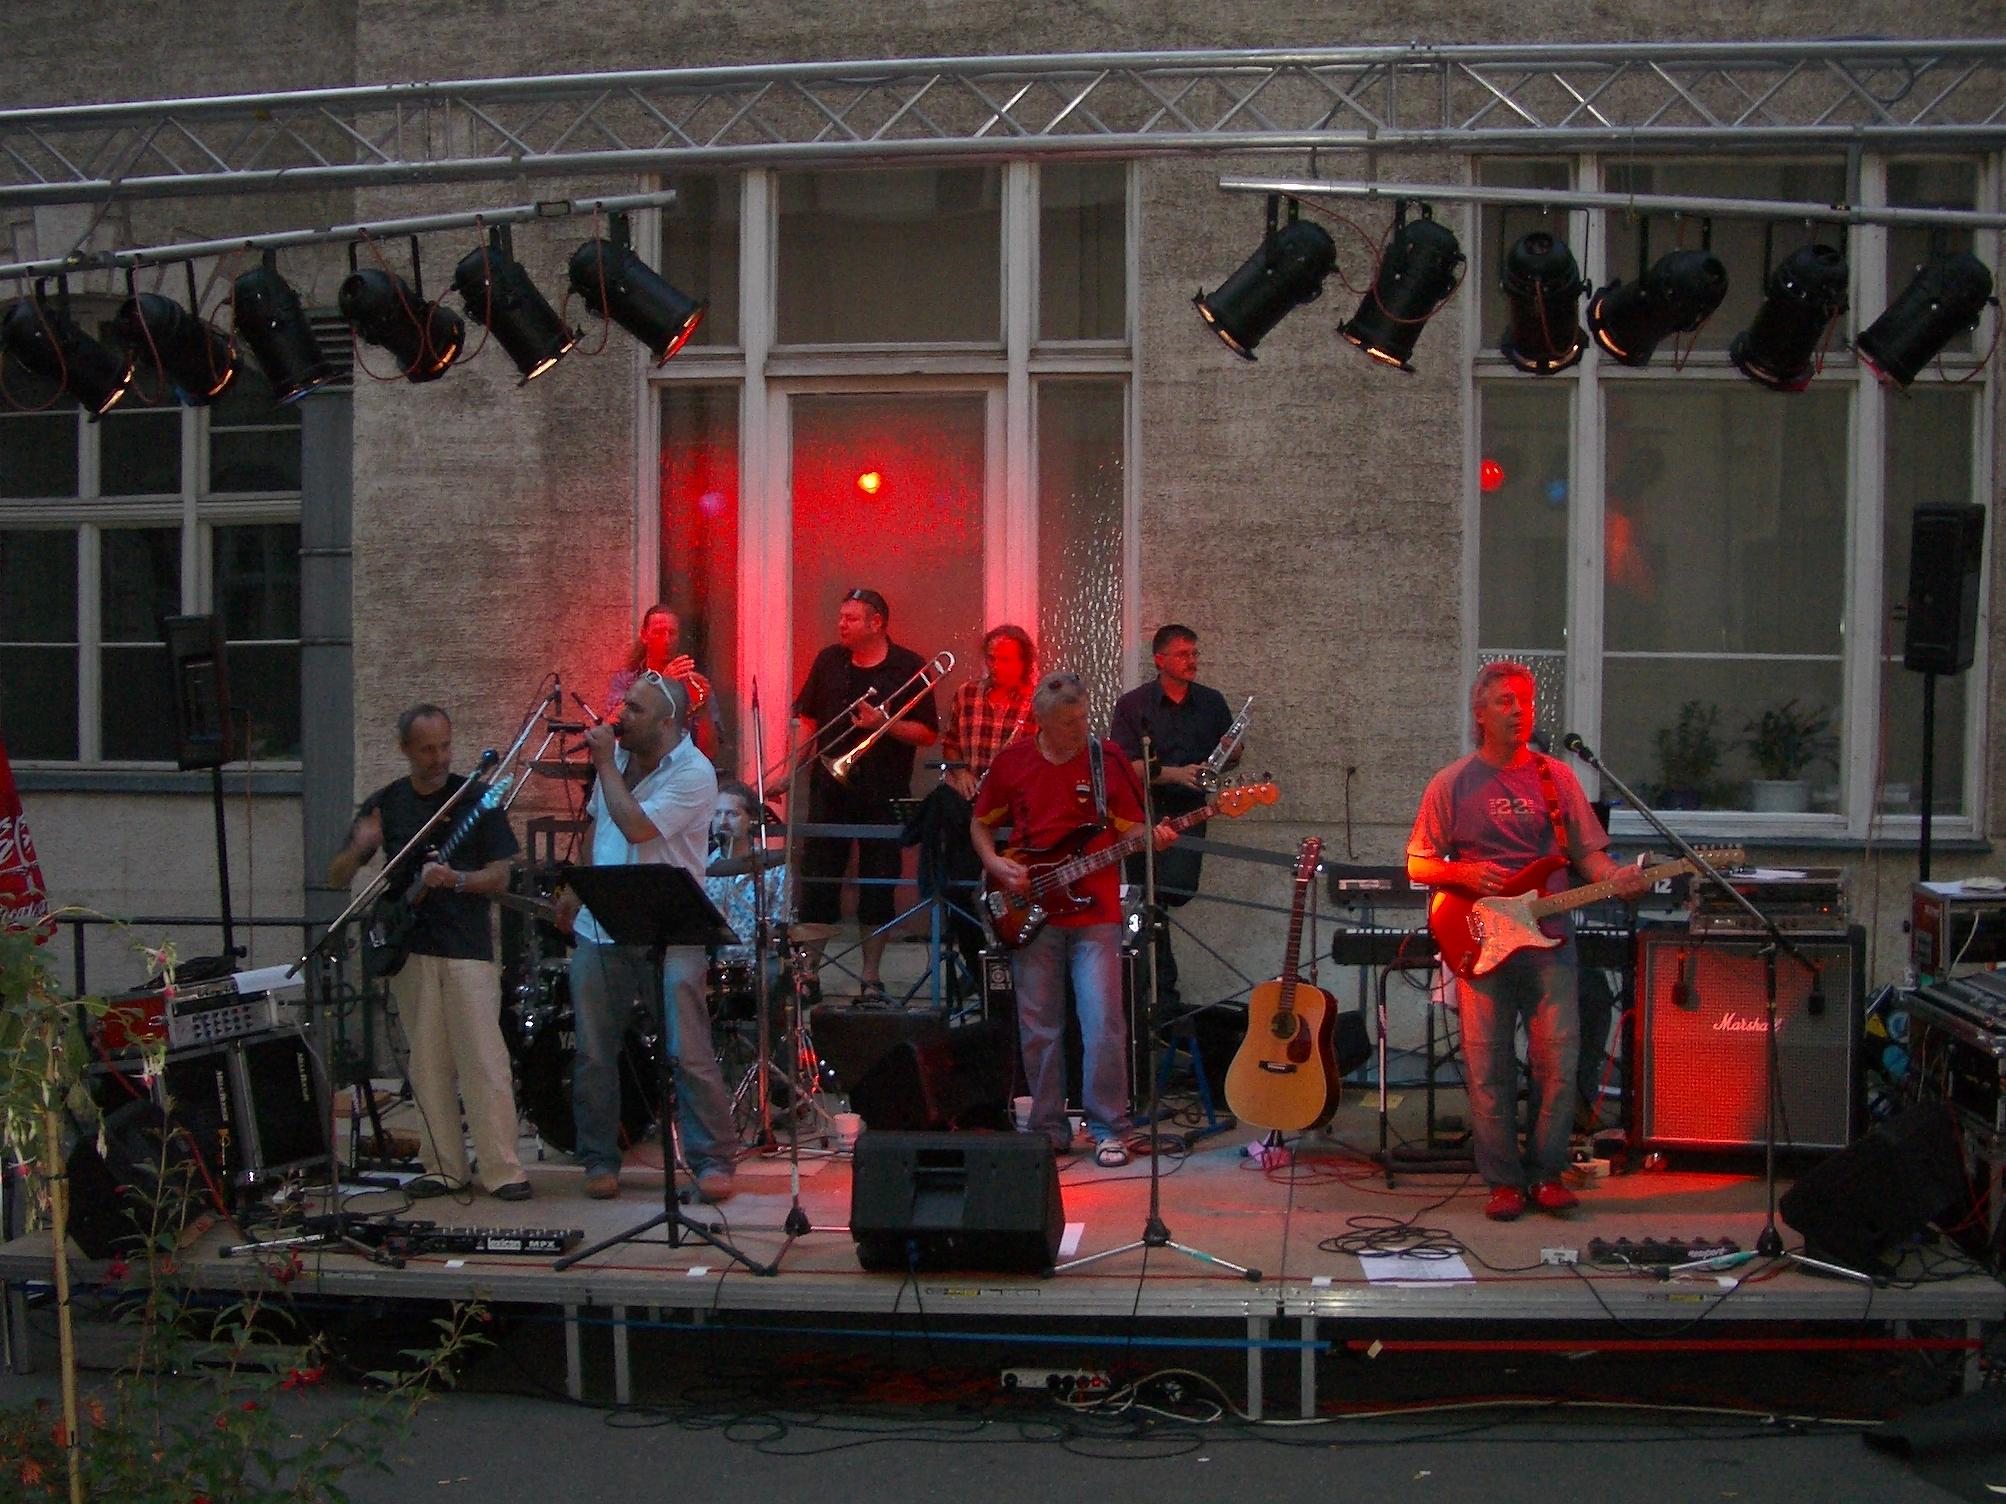 Konzerte im Bürgerhof 2006 Newport - Freiwilligen-Zentrum Augsburg - Foto: Wolfgang F. Lightmaster